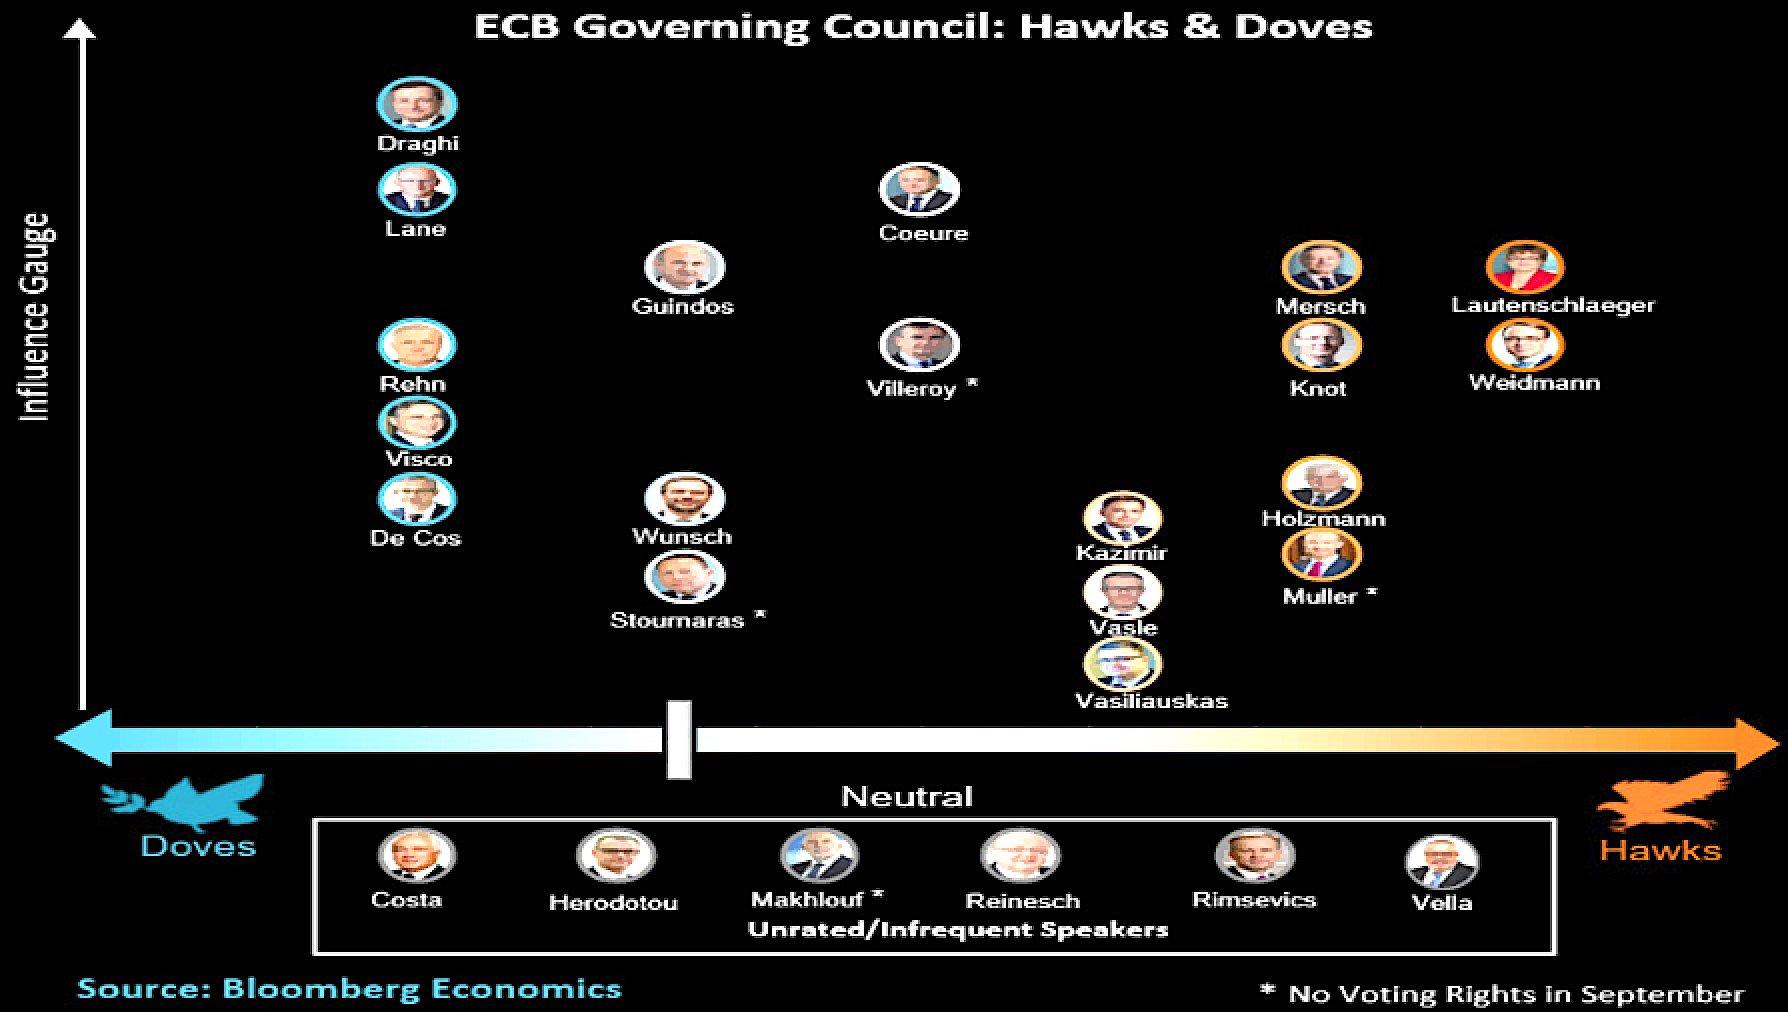 ECB_hawks_doves